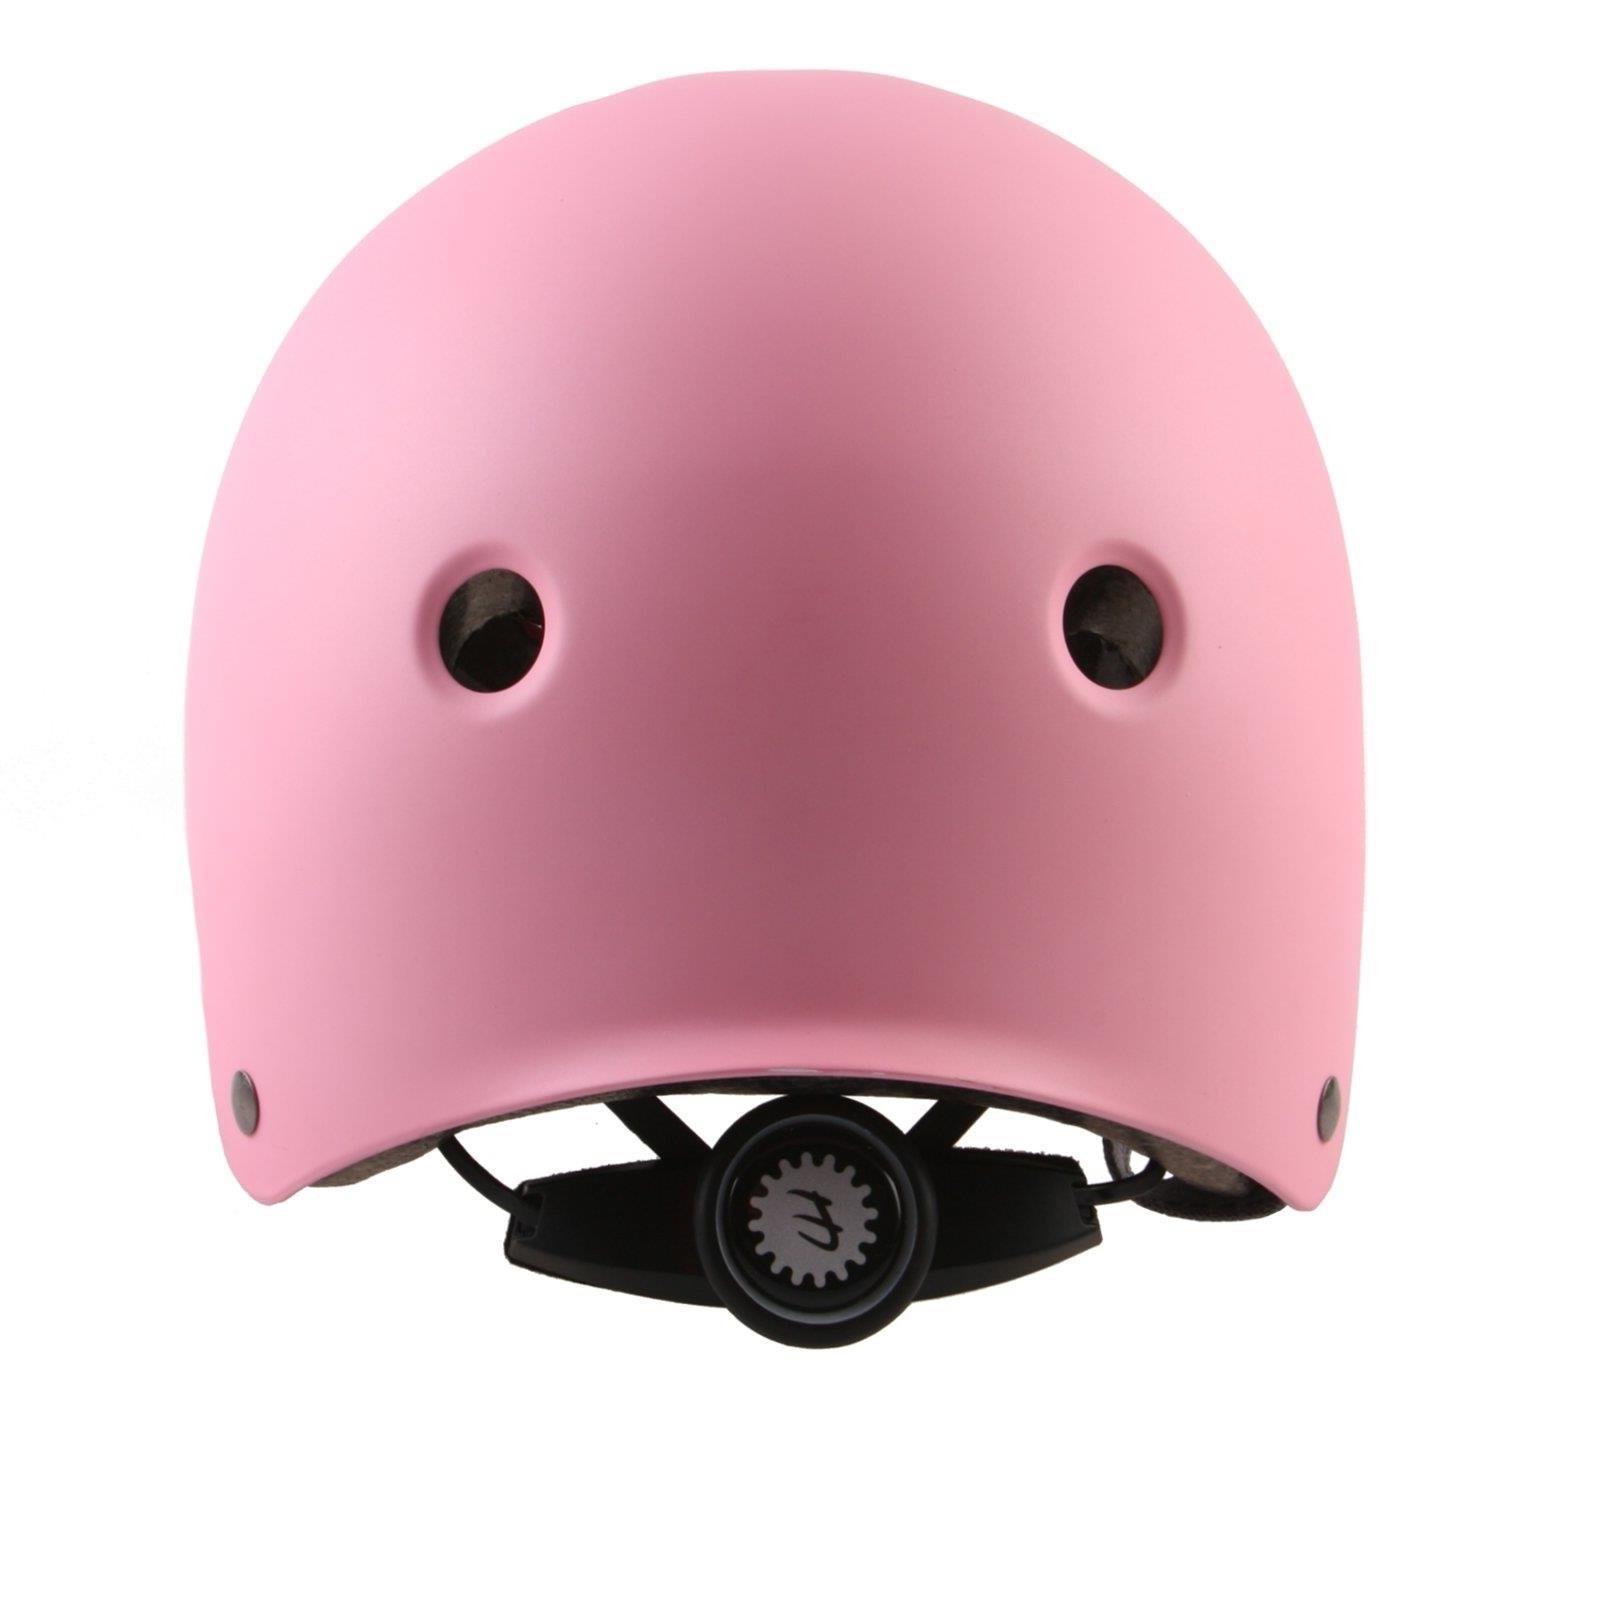 Electra Fahrrad Helm Solid Farbe Serie Fidlock Fidlock Fidlock ABS Innenpolster Rosa Quartz a58dd0